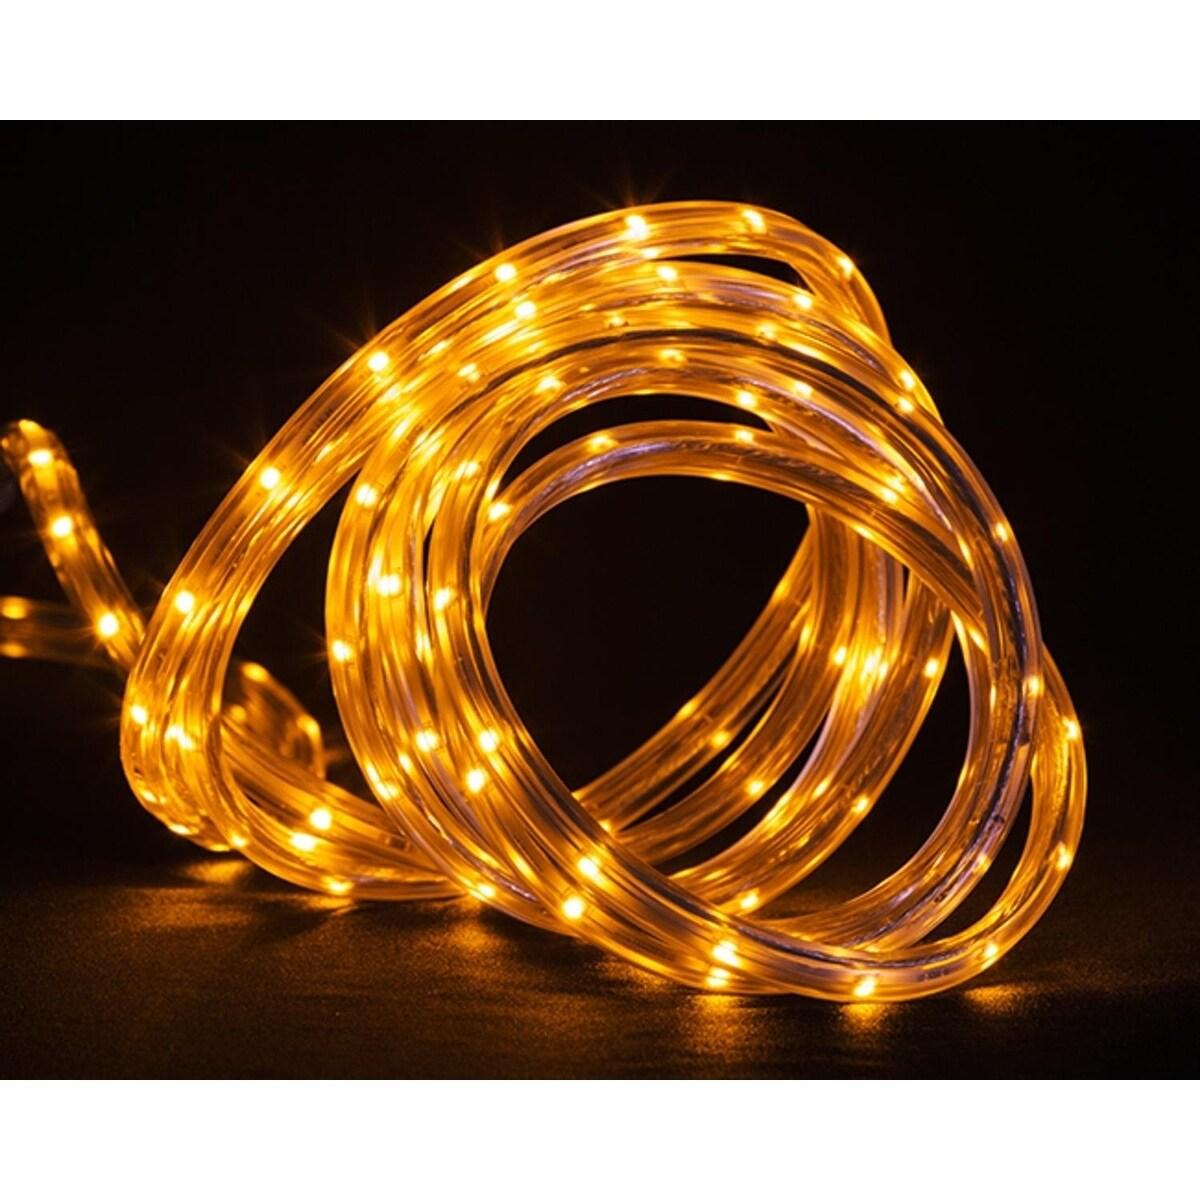 CC Christmas 30' Amber LED Indoor/Outdoor Christmas Linea...